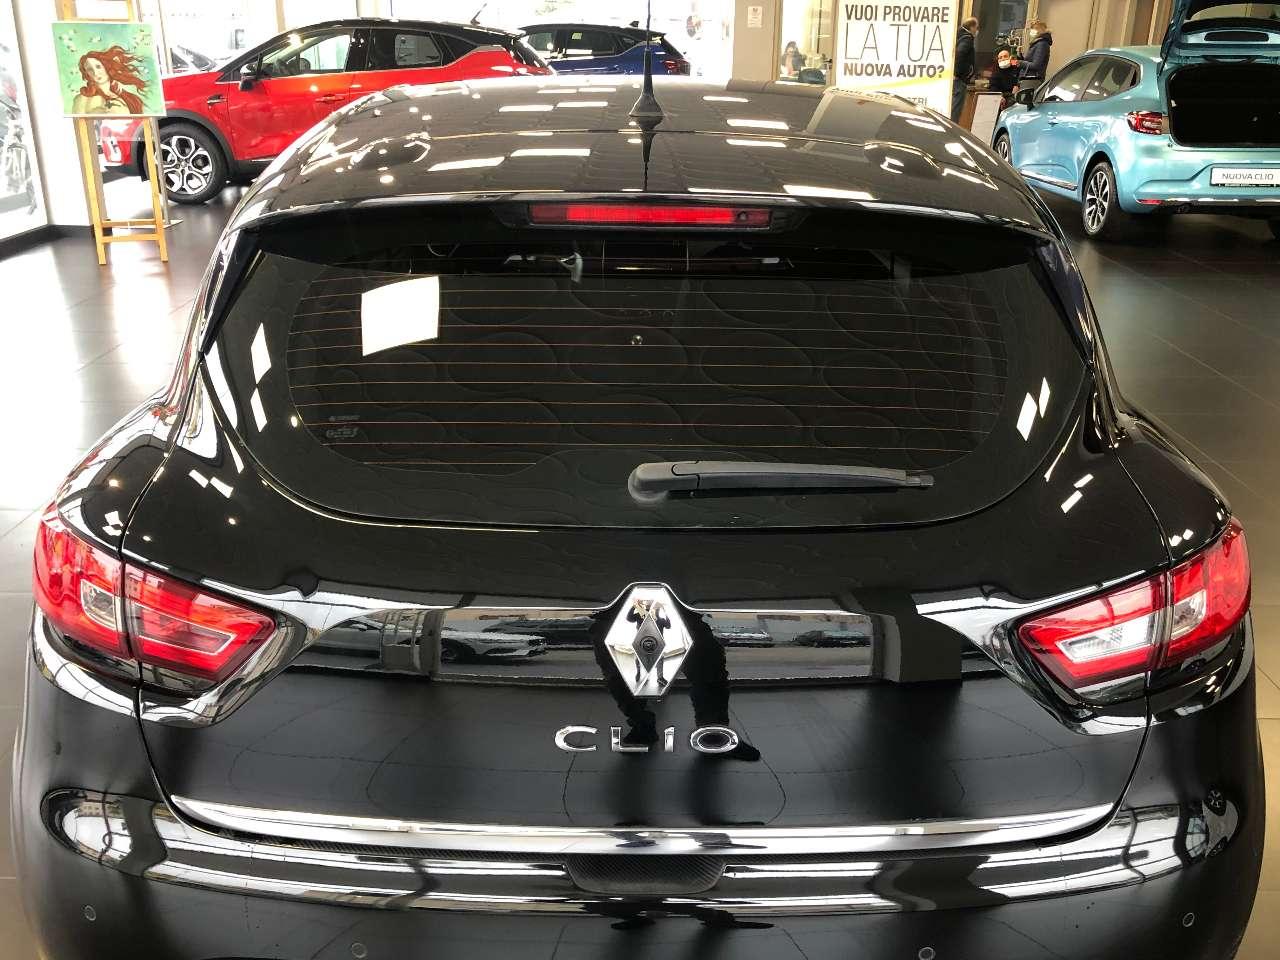 Renault Clio dCi 8V 90CV Duell